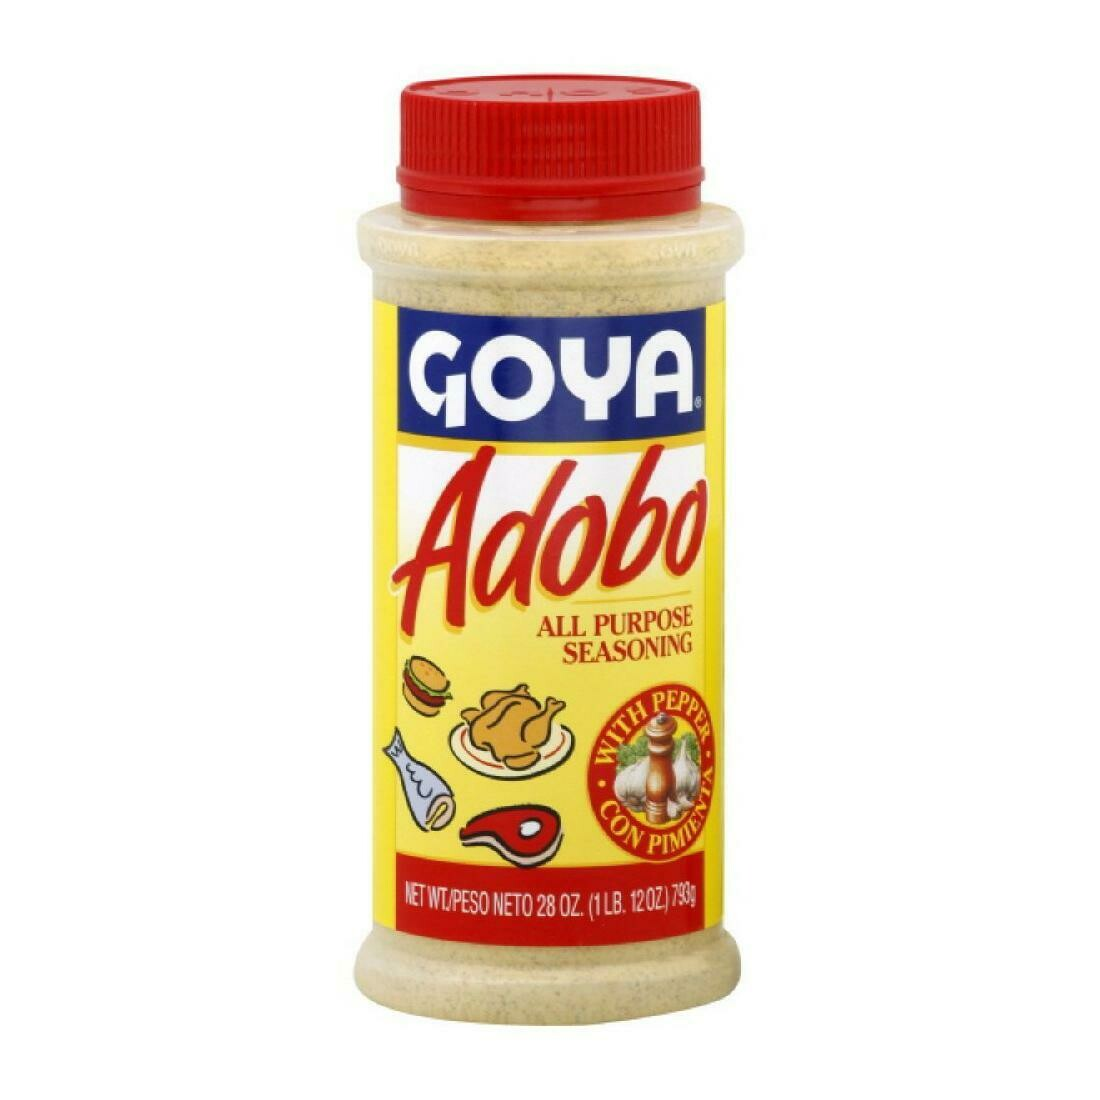 * Goya Adobo With Pepper 28 Ounces Jar